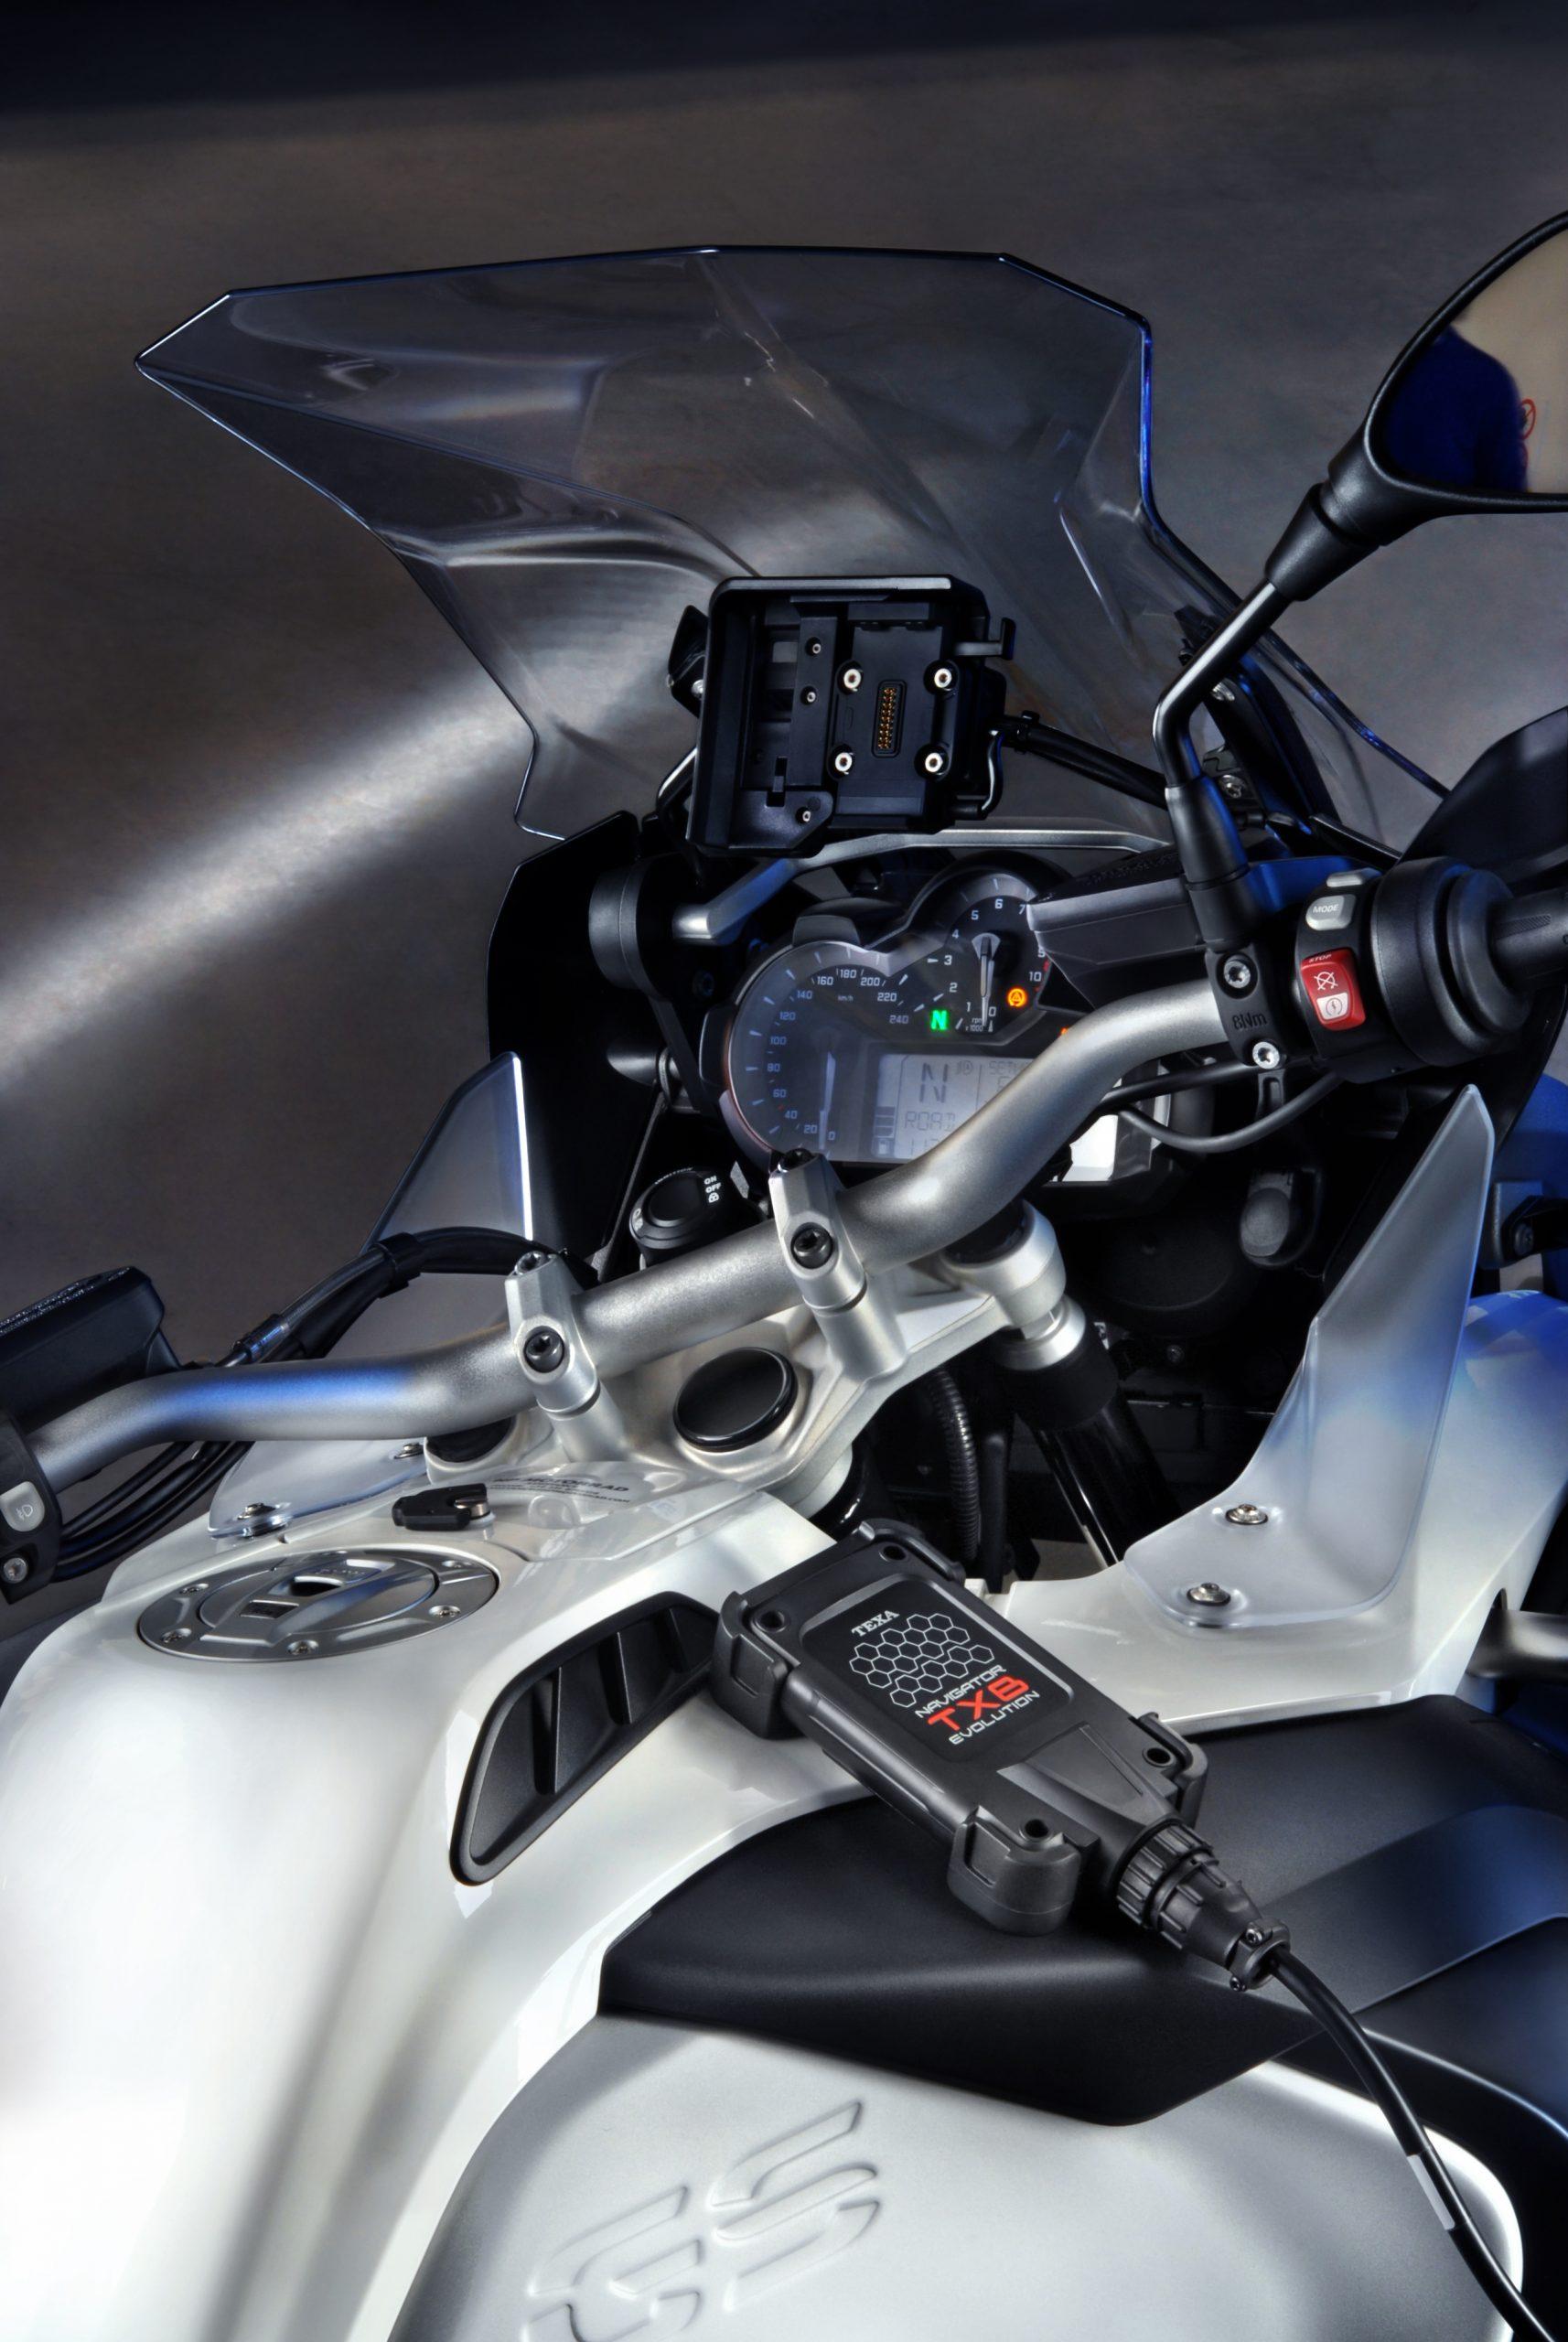 Escaner multimarca para motocicletas navigator TXB evolution